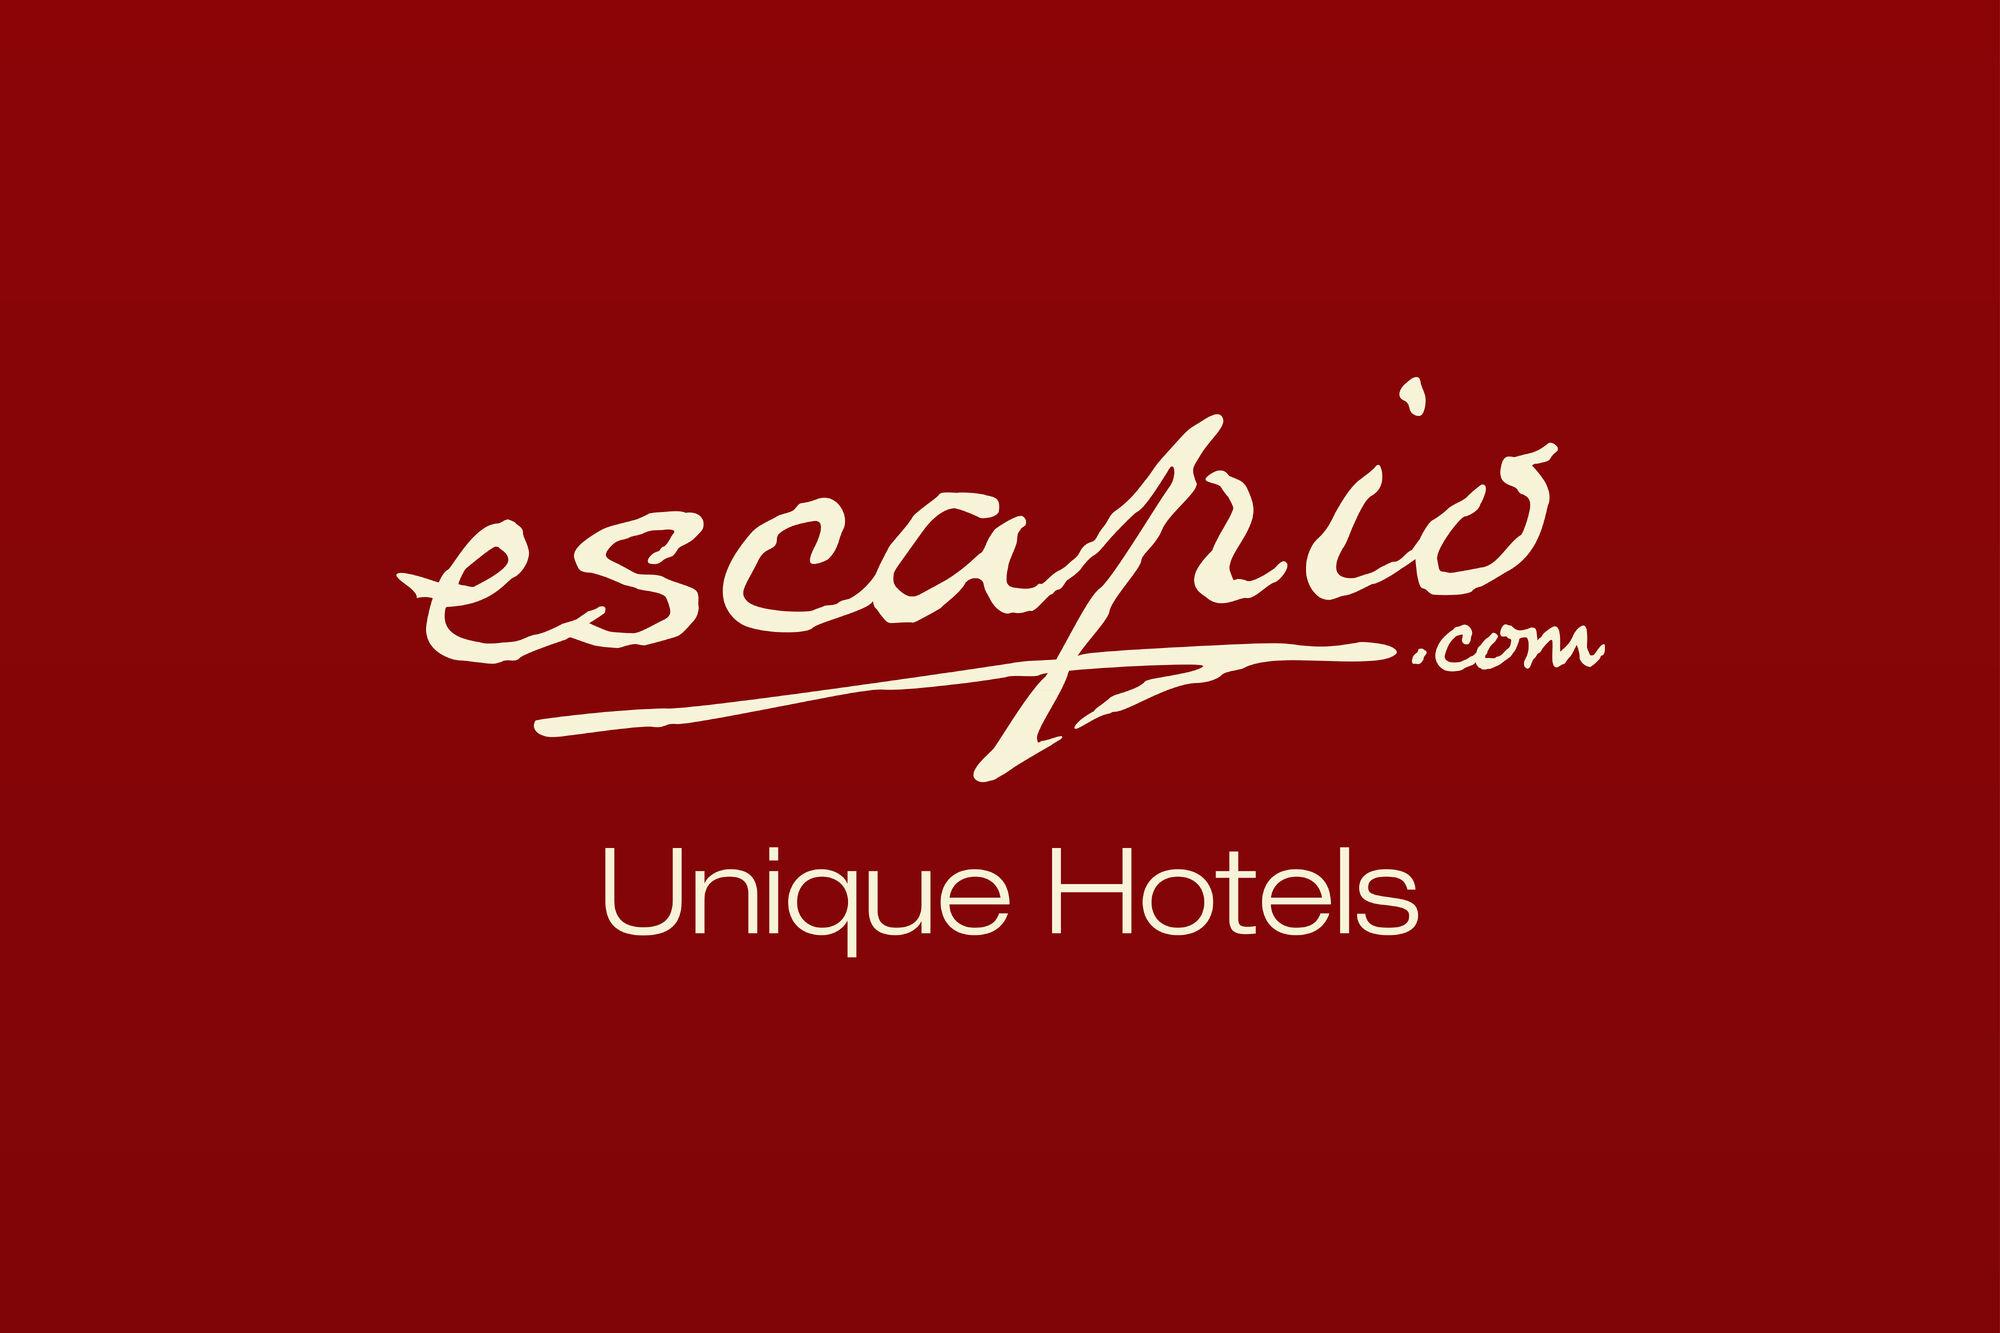 Escapio hotels logopedia fandom powered by wikia for Escapio hotels